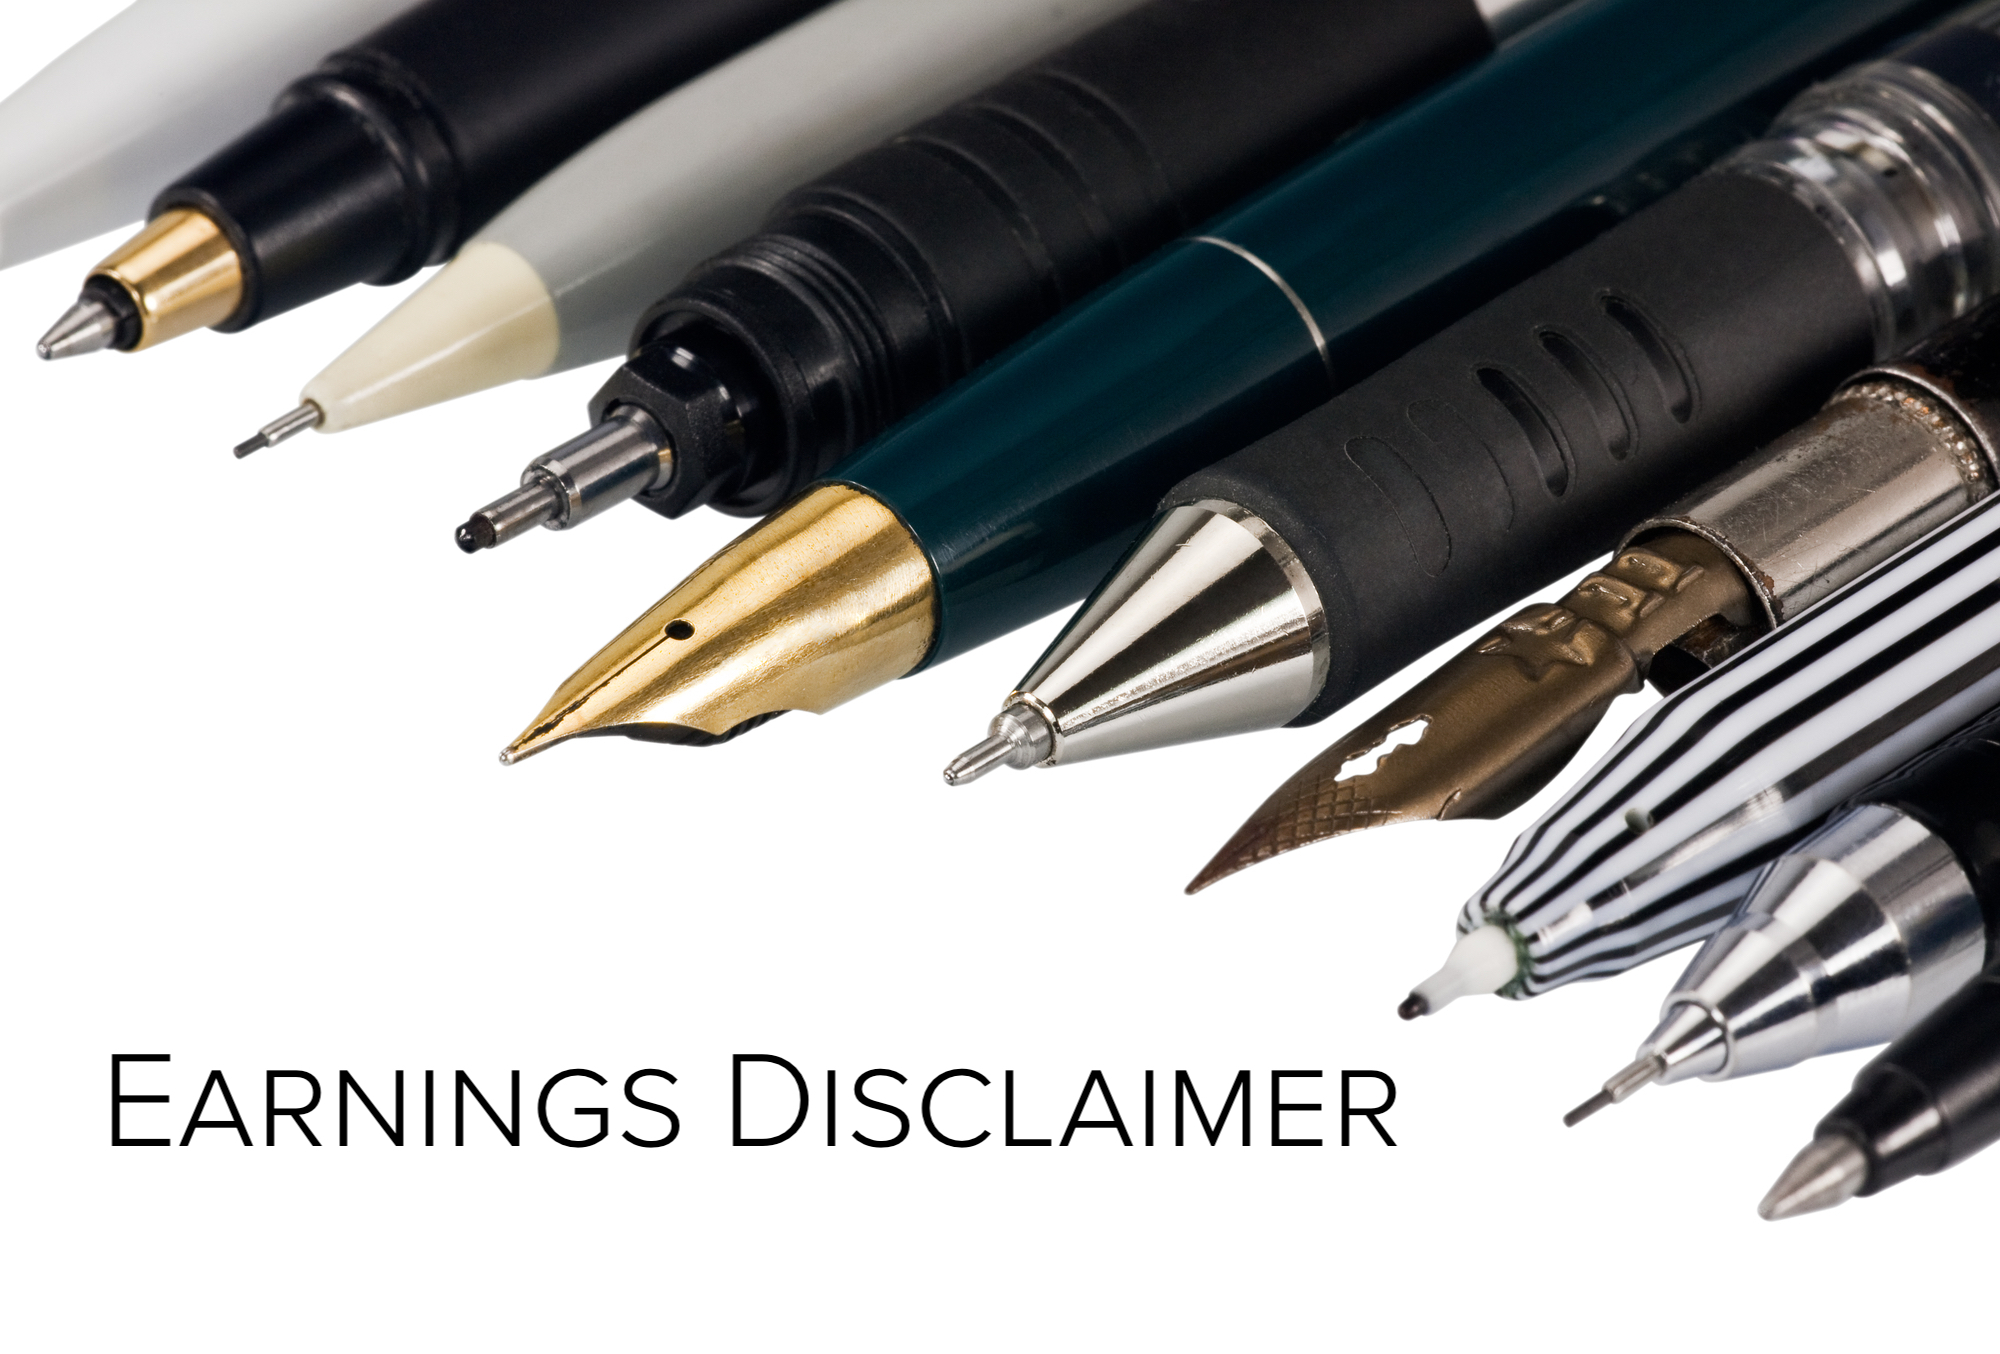 various fountain pens, ball pens and pencils